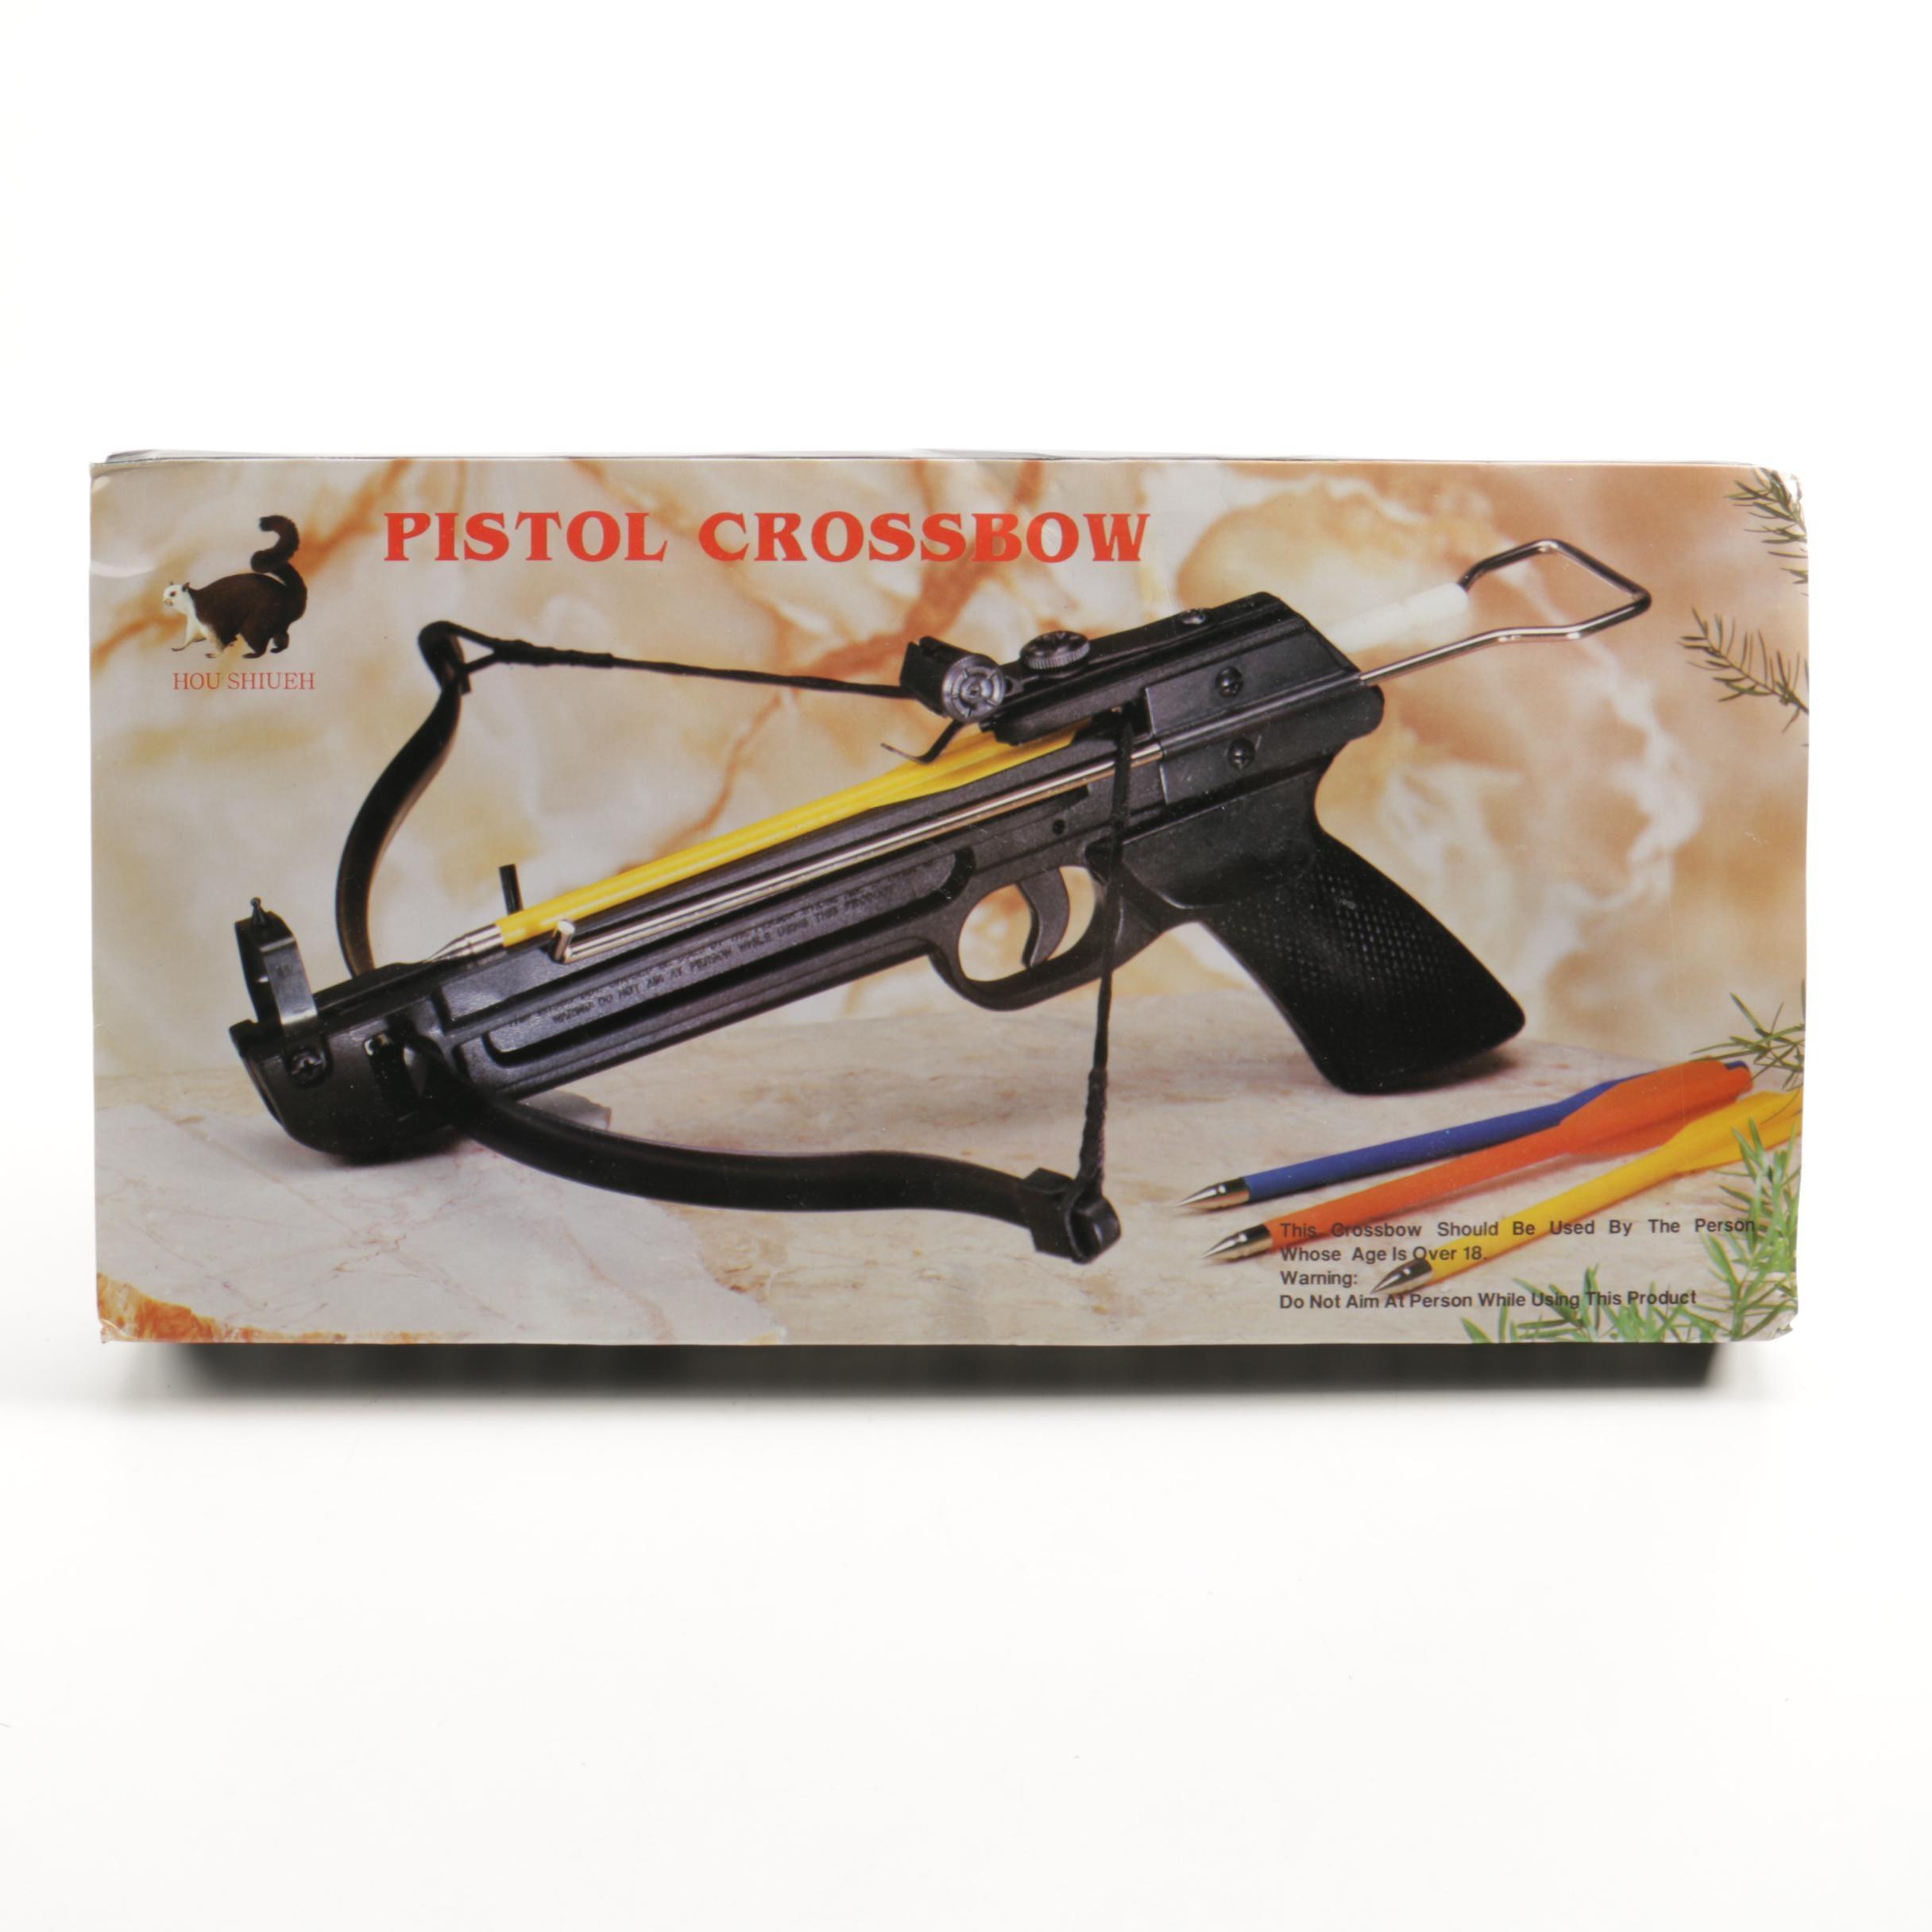 Hou Shiueh Pistol Crossbow